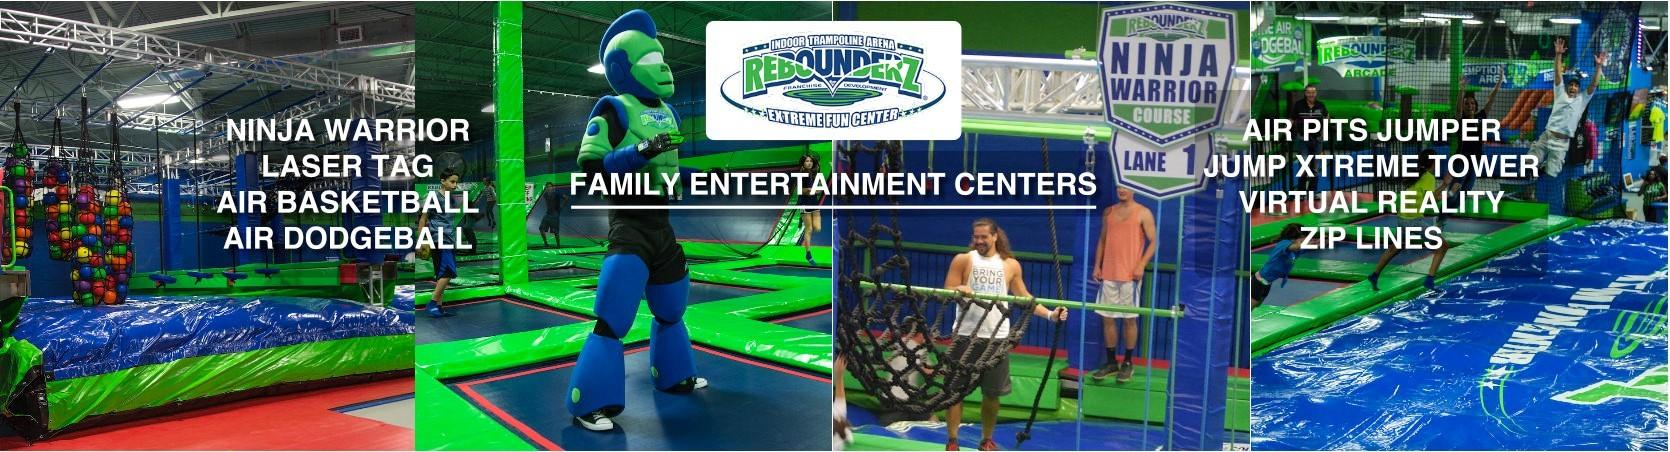 Rebounderz International Family Entertainment Centers Linkedin